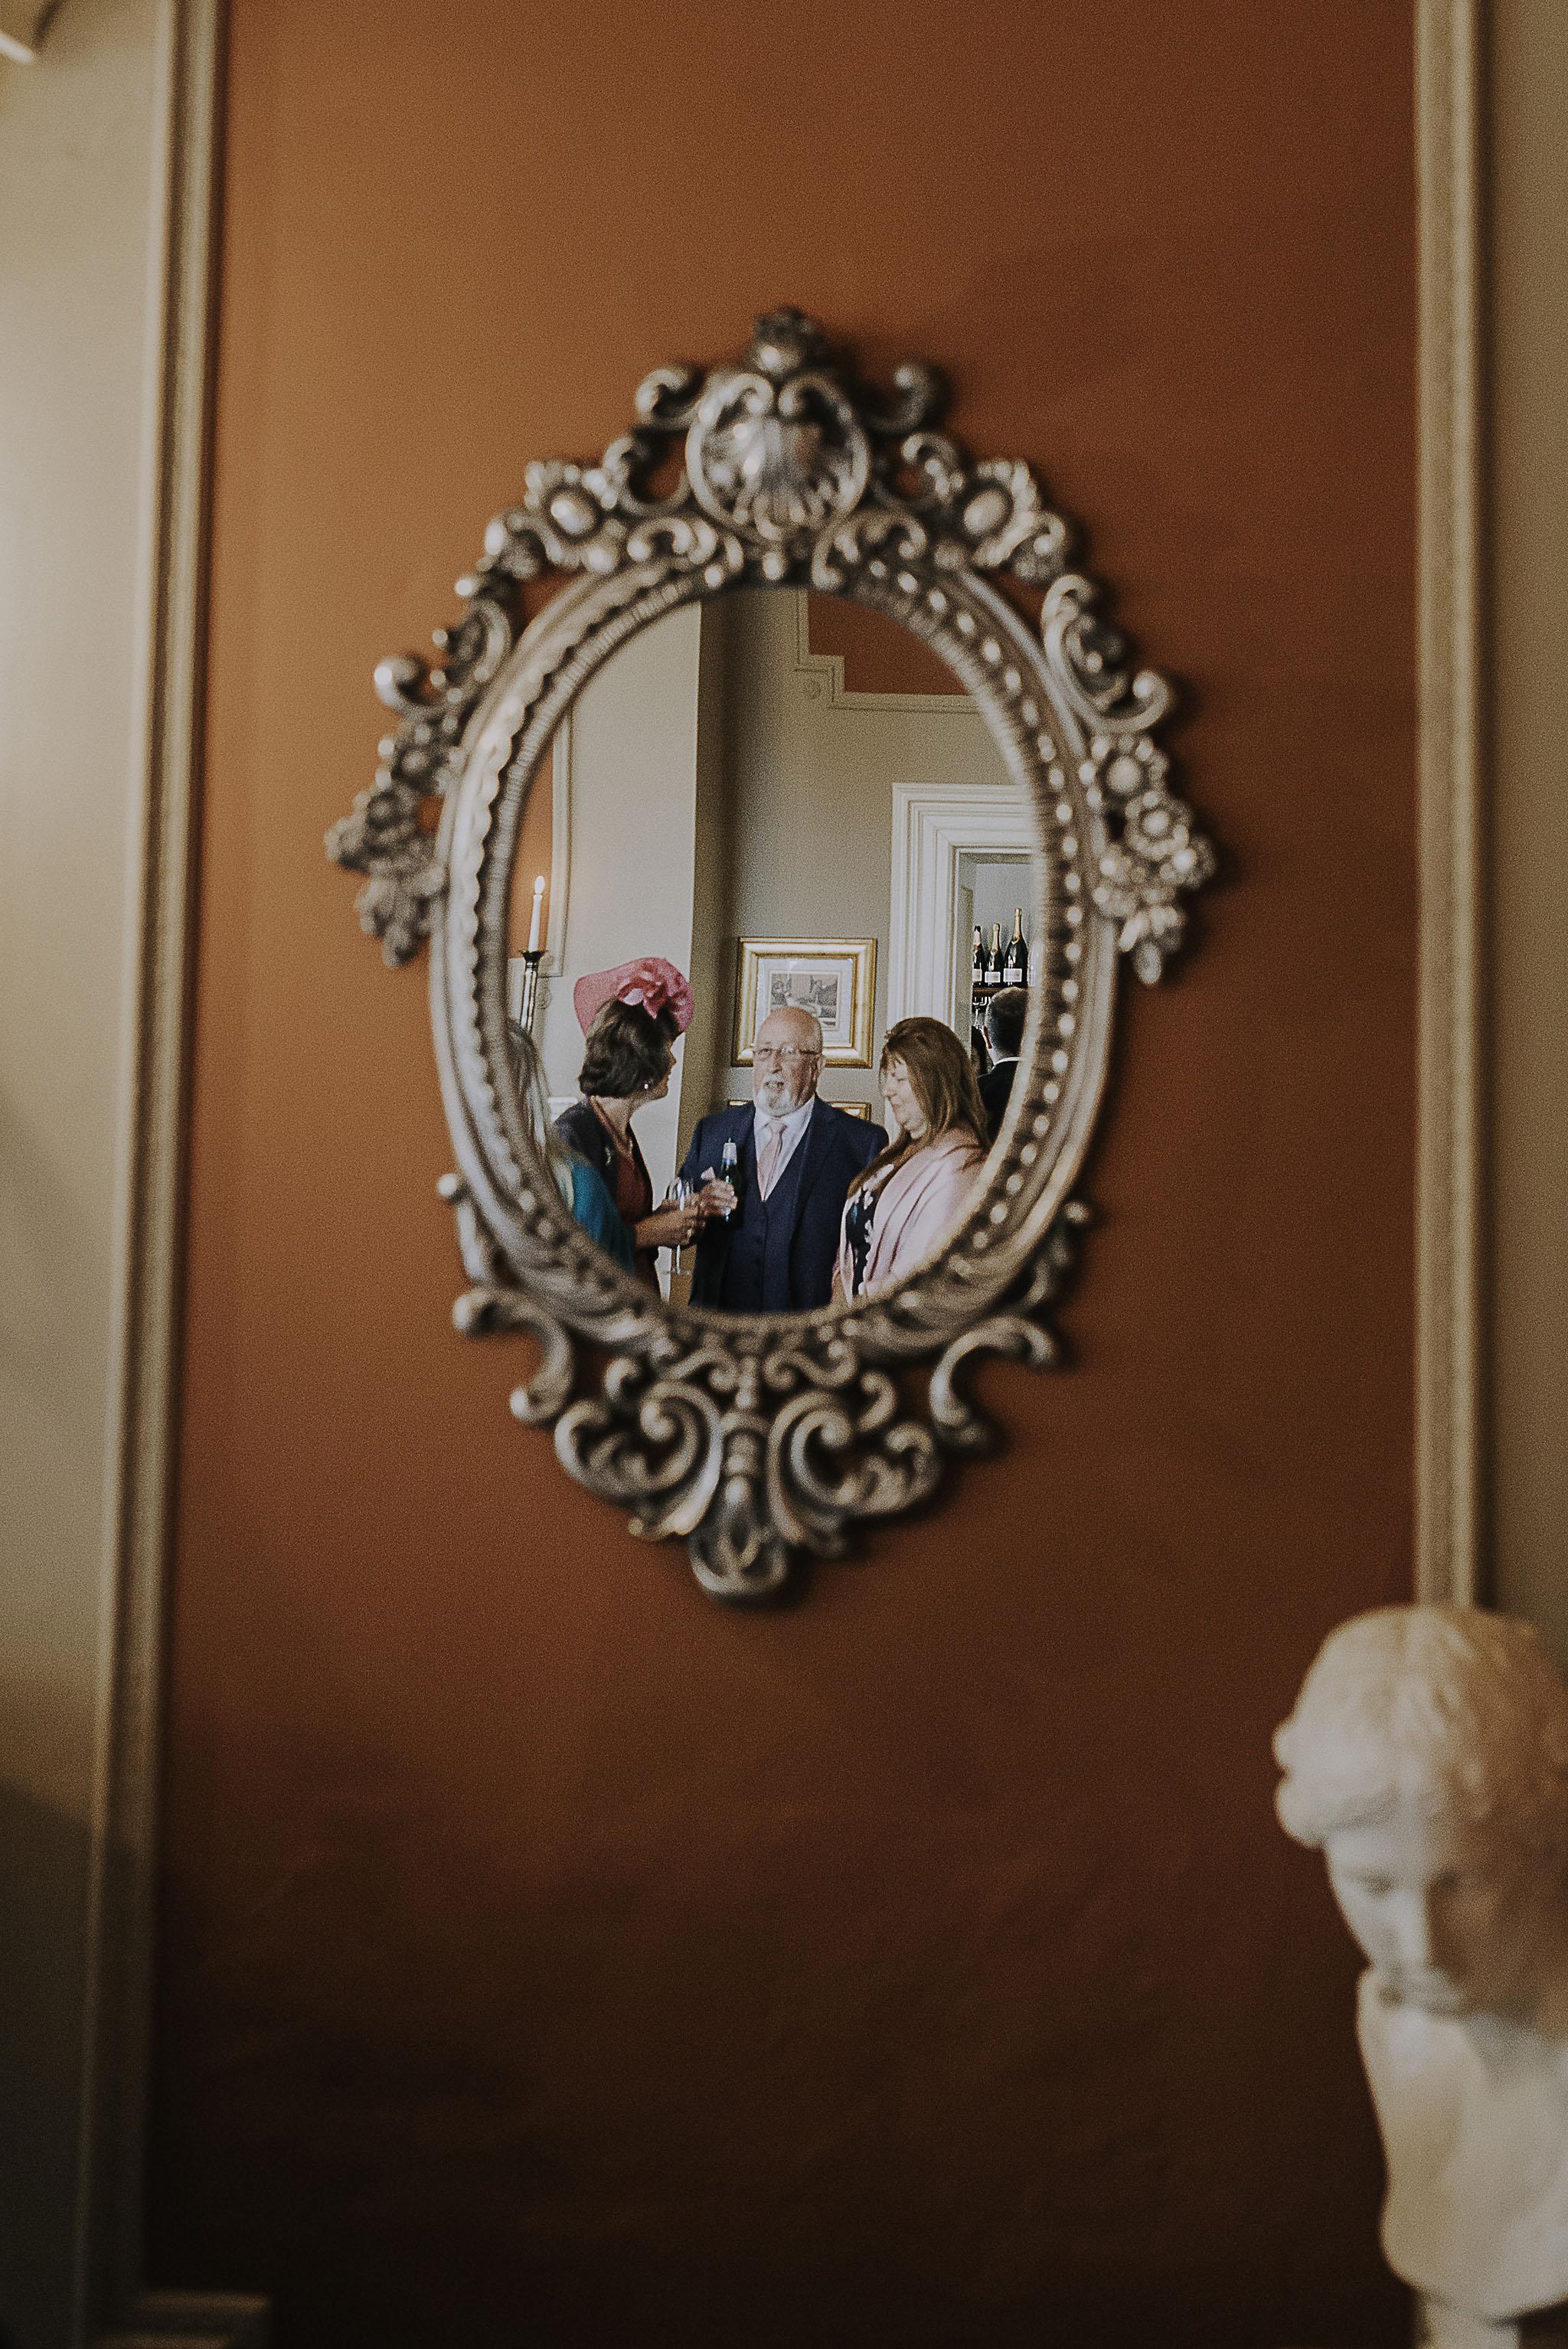 scott-stockwell-photography-wedding-005.jpg